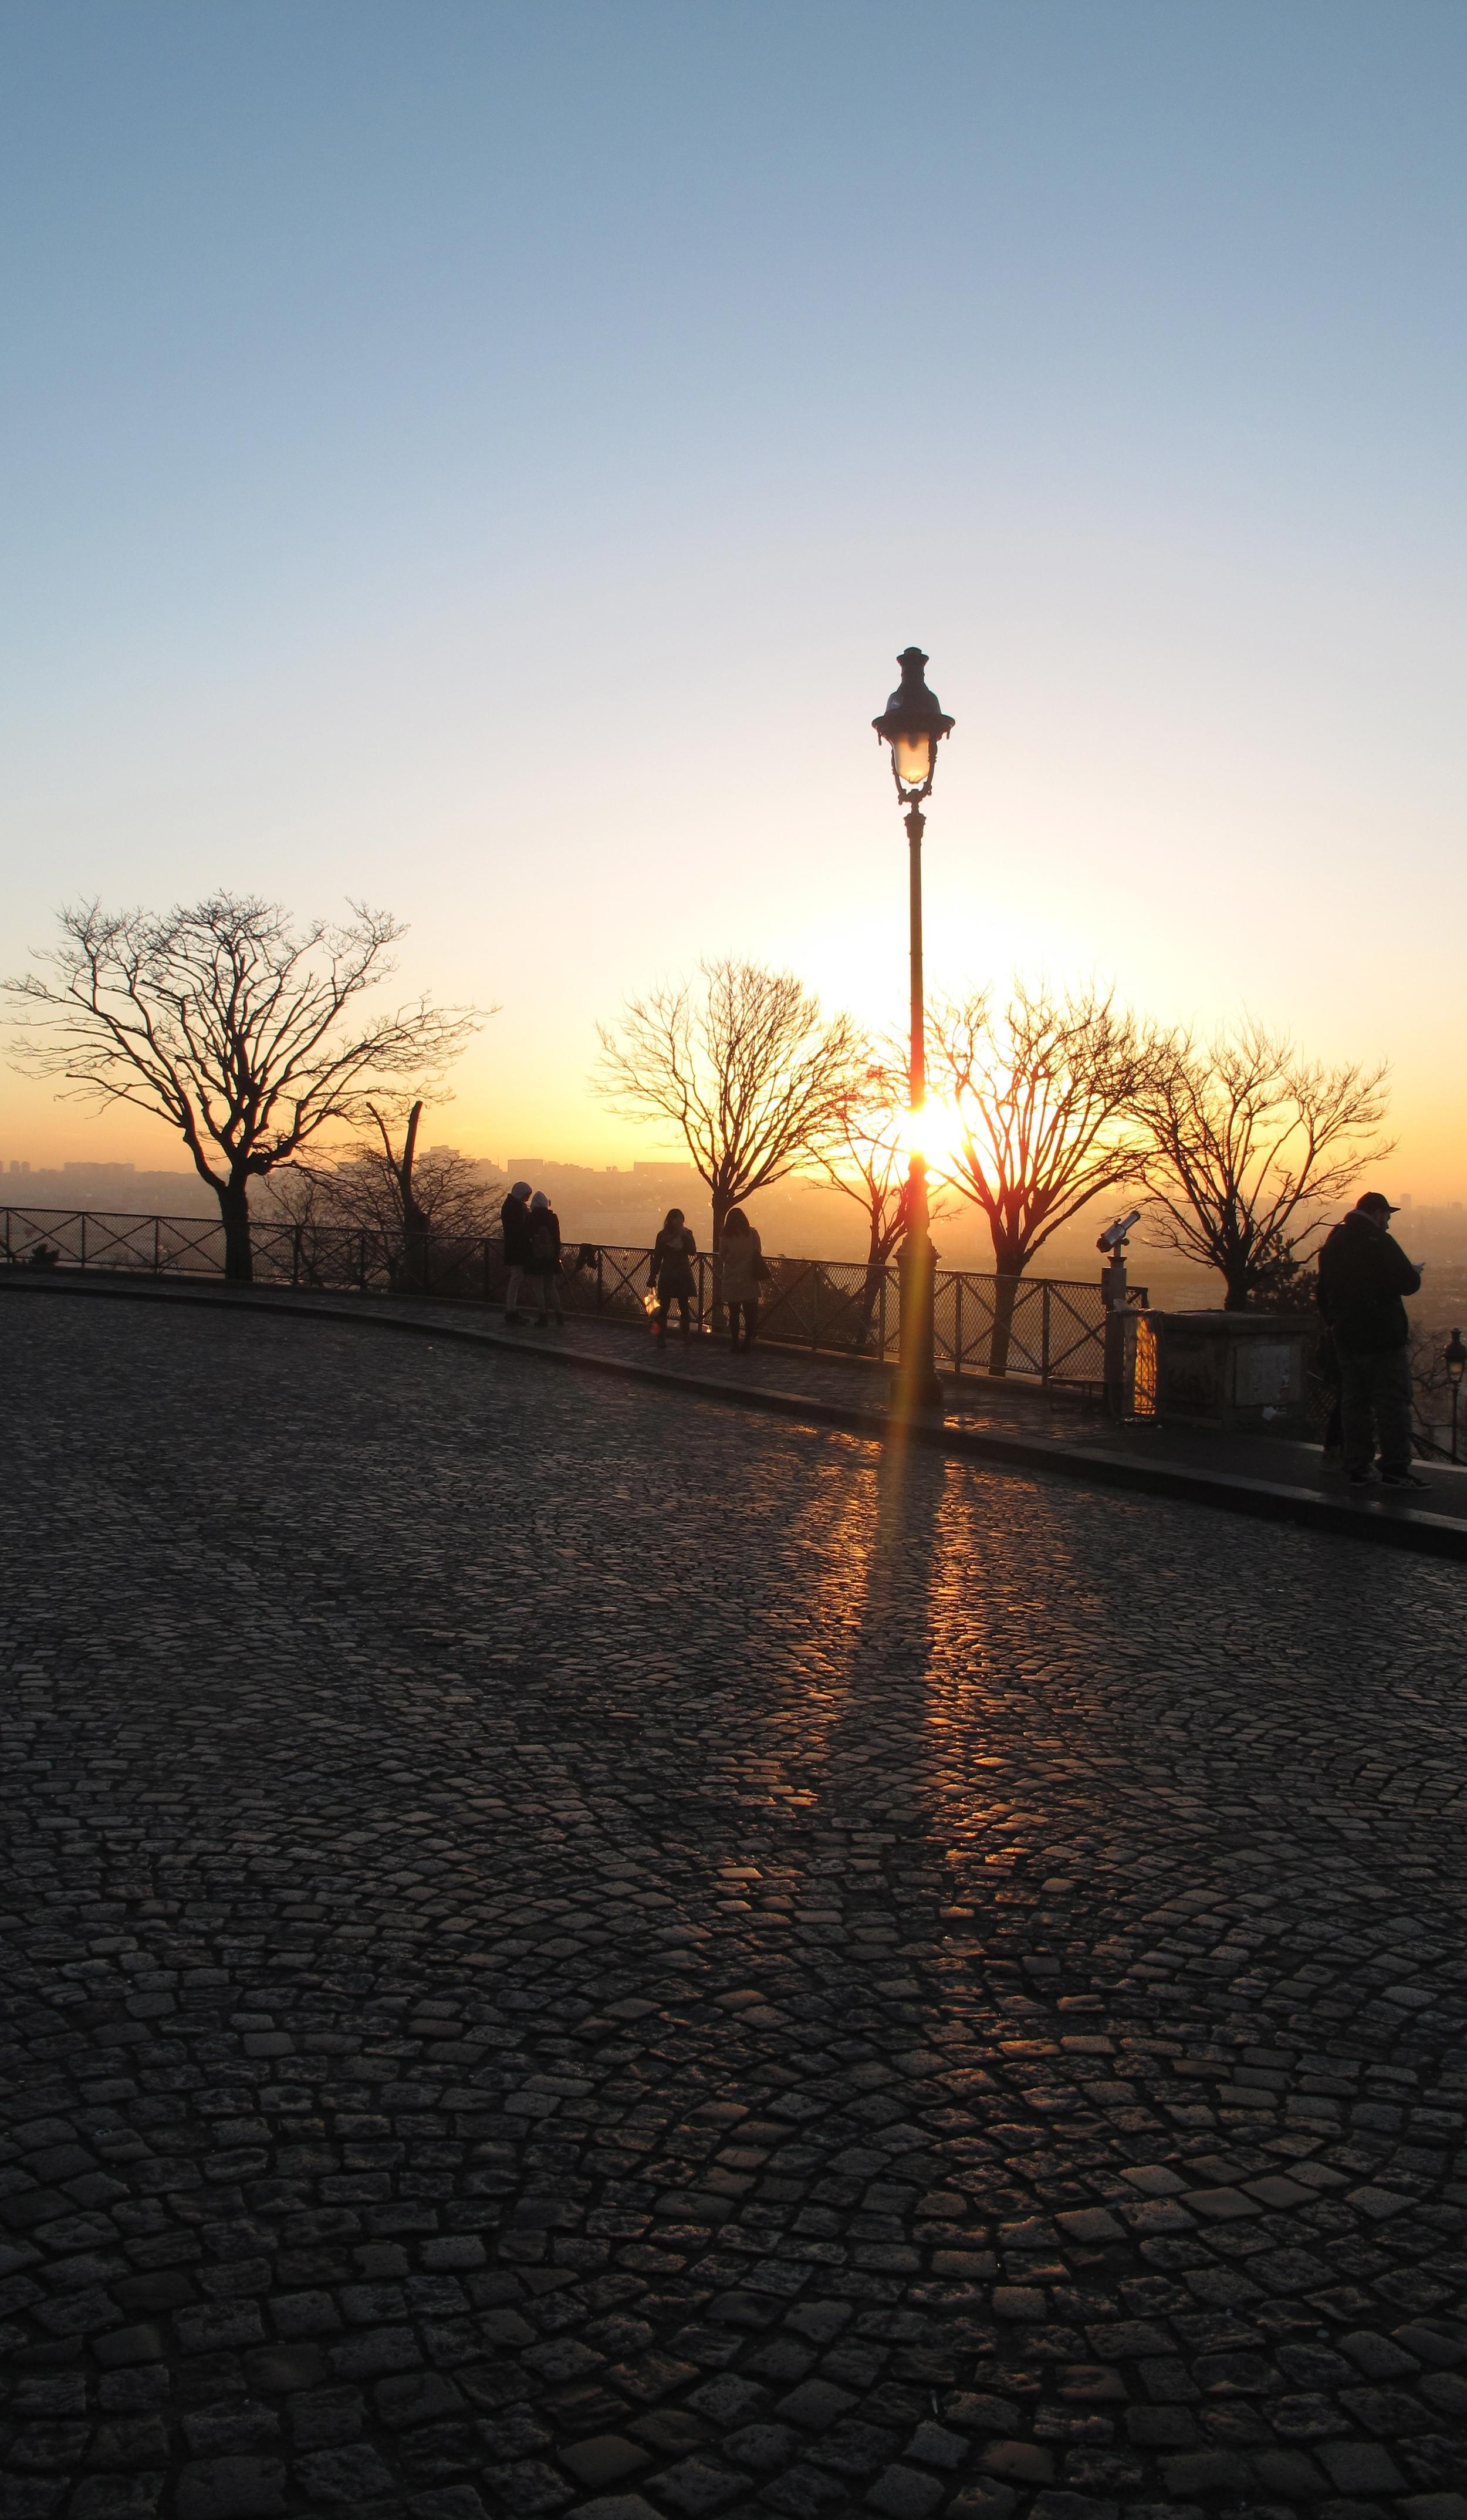 Sunrise on the cobblestones of Montmartre, Paris